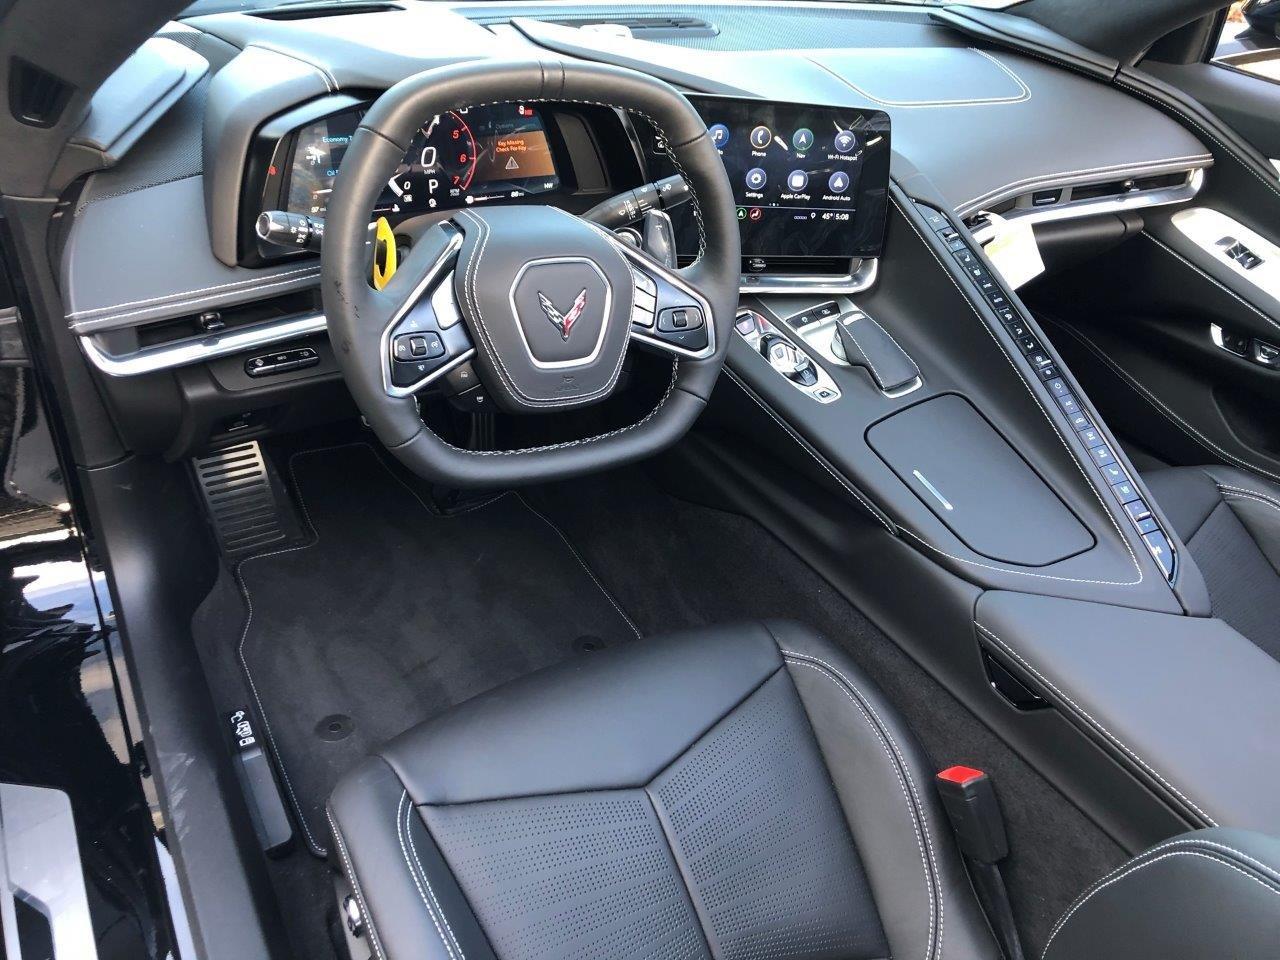 2020 Chevrolet Corvette C8 Z51 Stingray 3LT Coupe For Sale (picture 7 of 12)